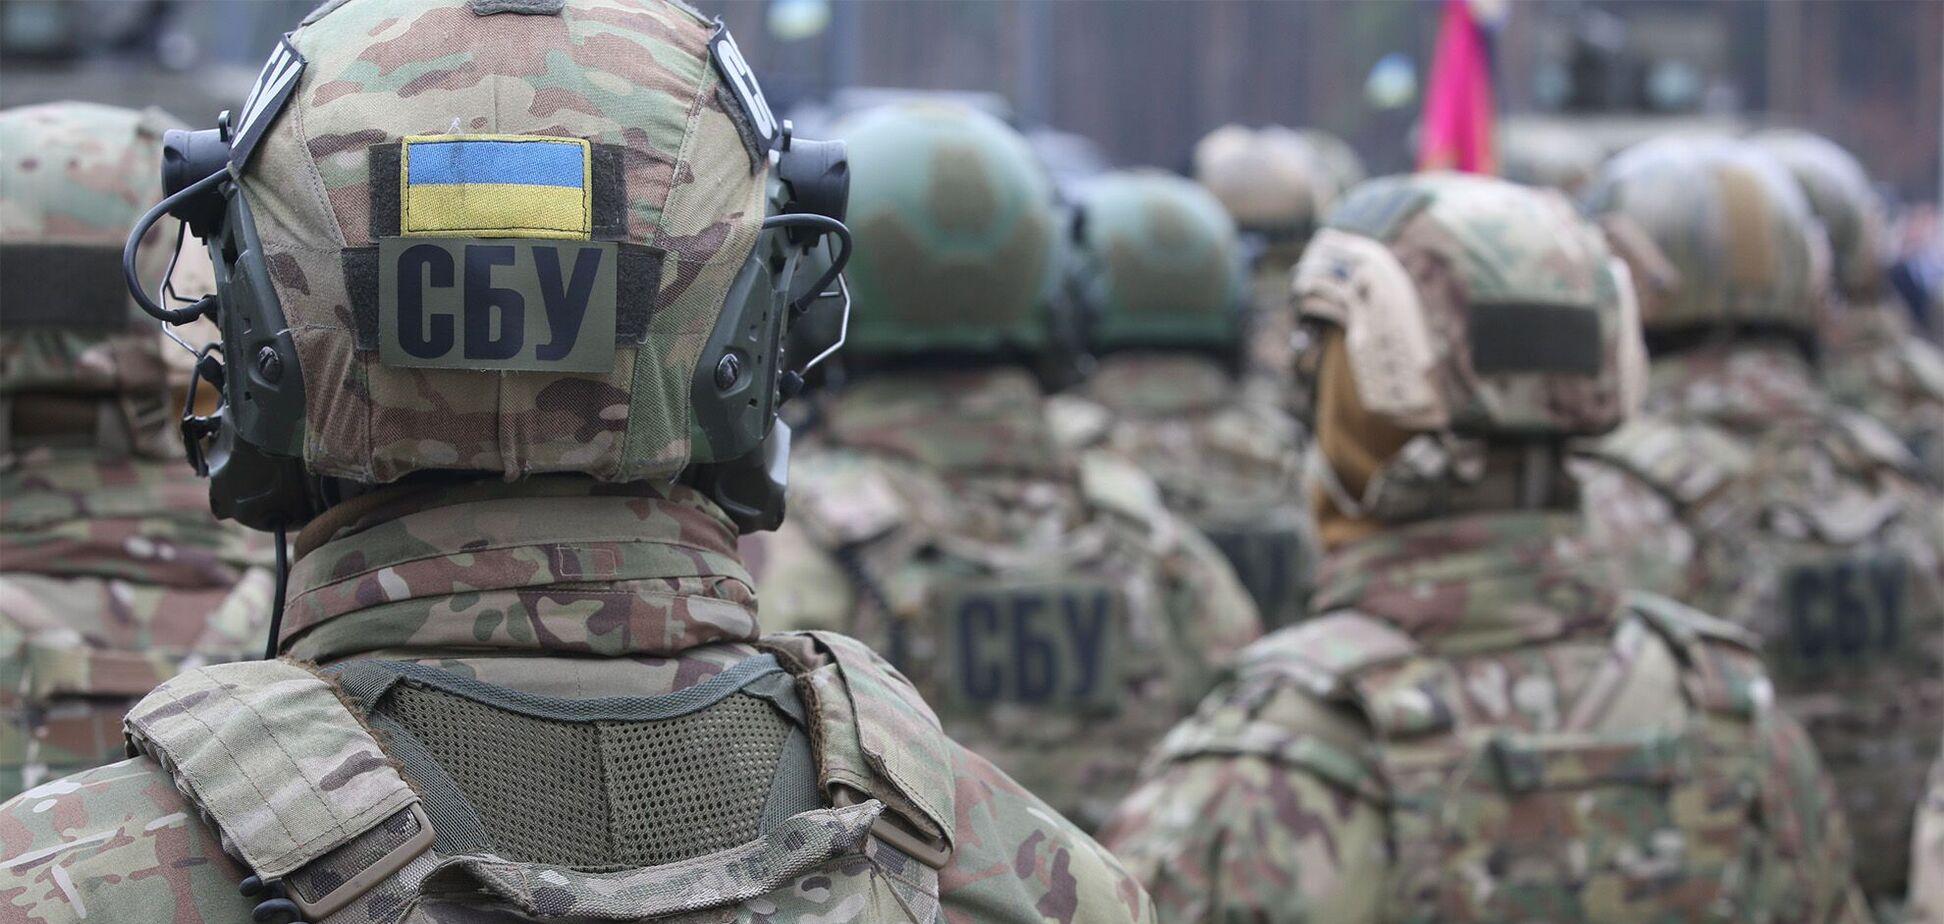 Бойцы Службы безопасности Украины